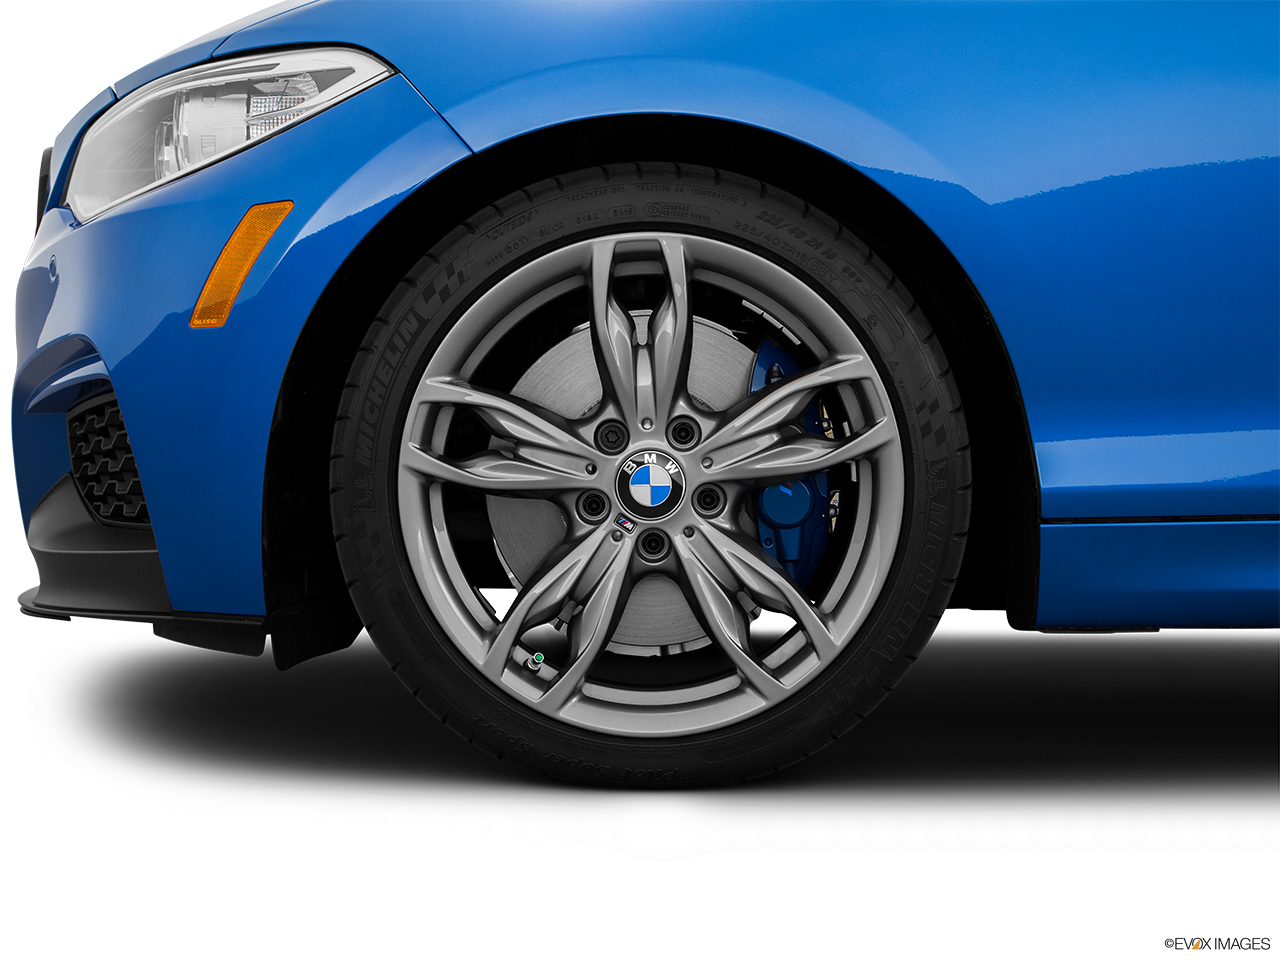 BMW 2 Series Coupe 2016 M235i in Saudi Arabia: New Car ...